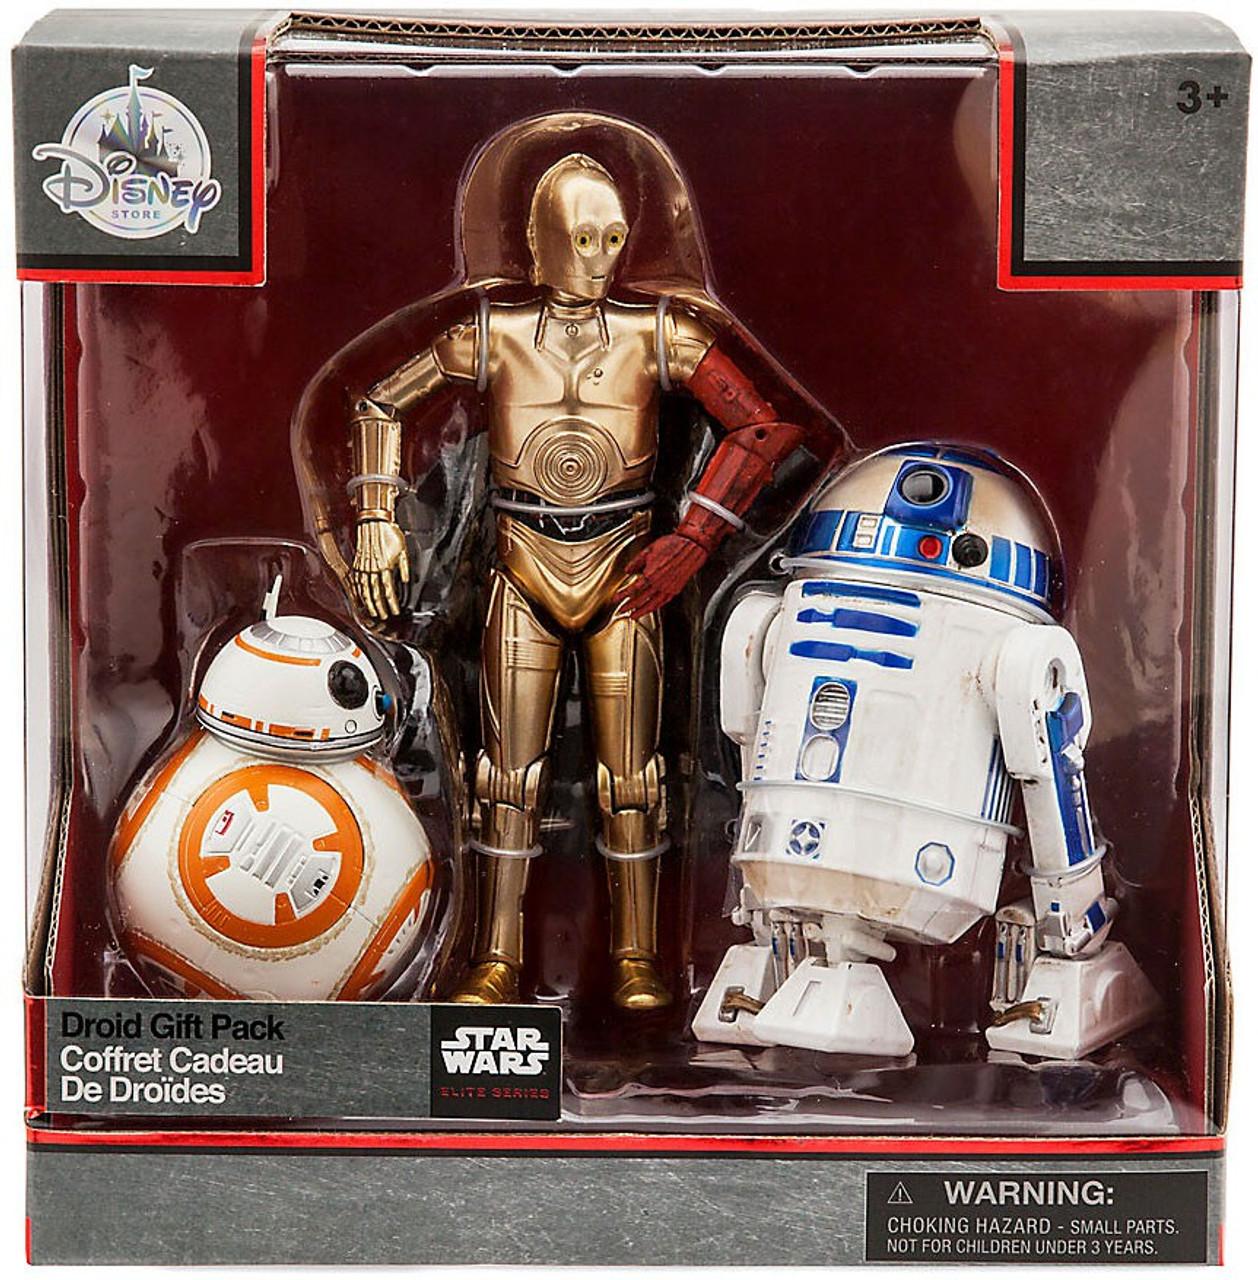 Disney Parks Star Wars Elite Series R2-D2 Die Cast Action Figure New